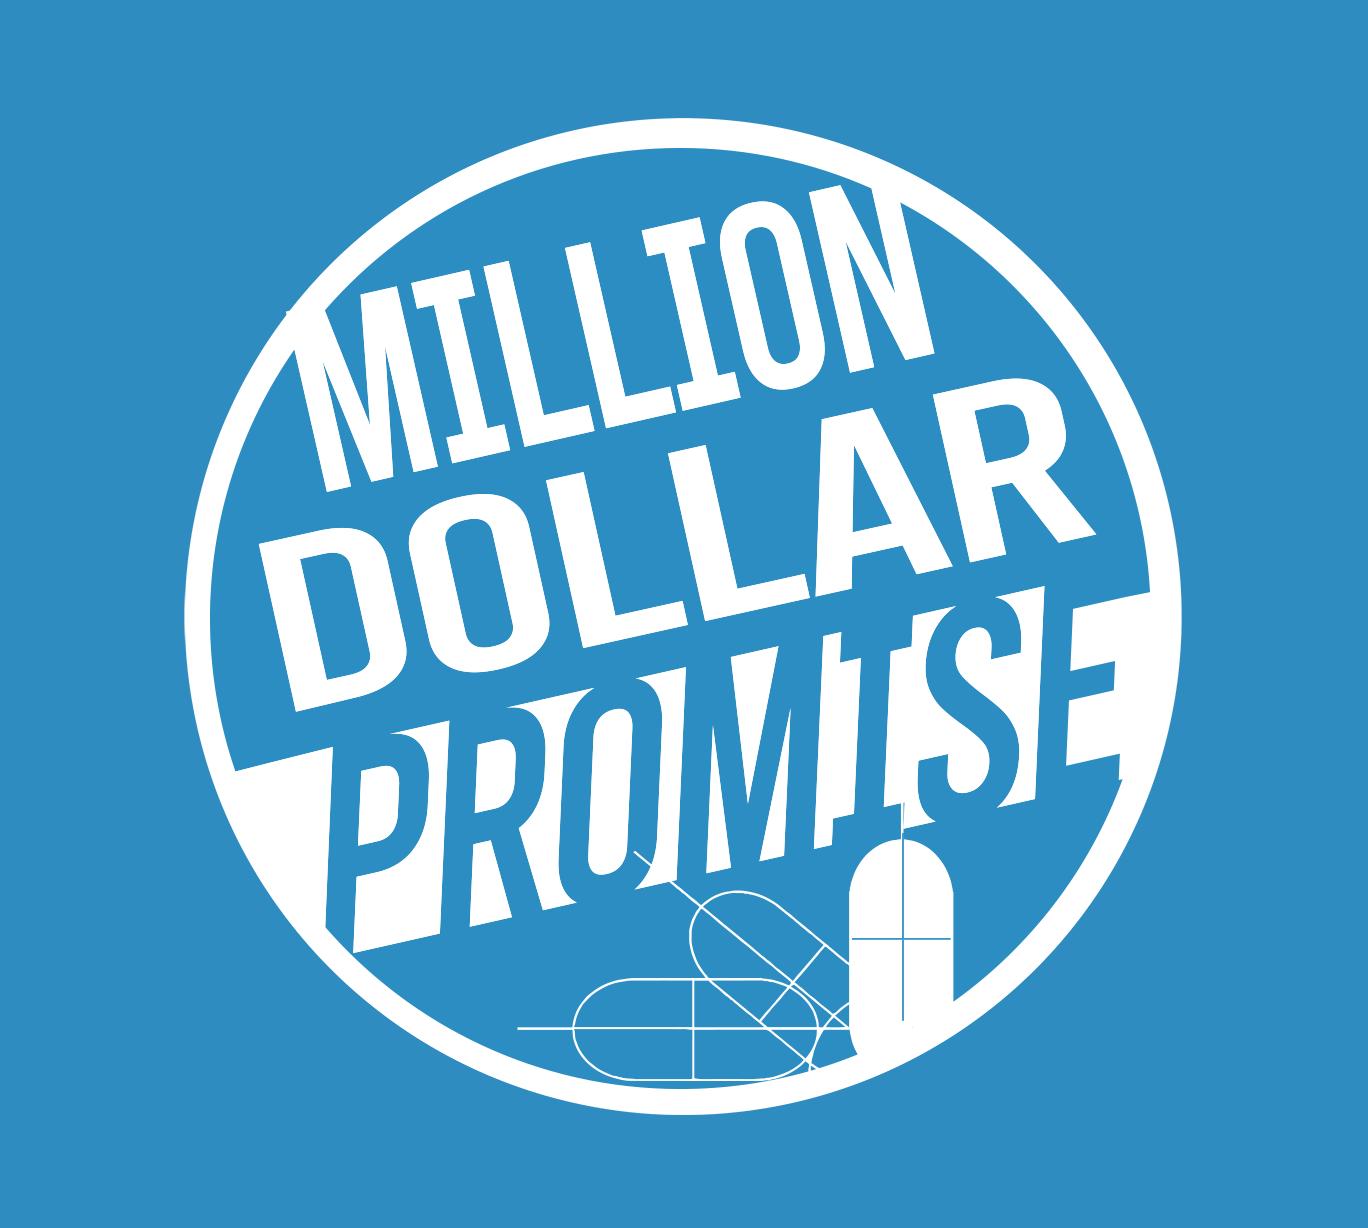 Project 150 Million Dollar Promise